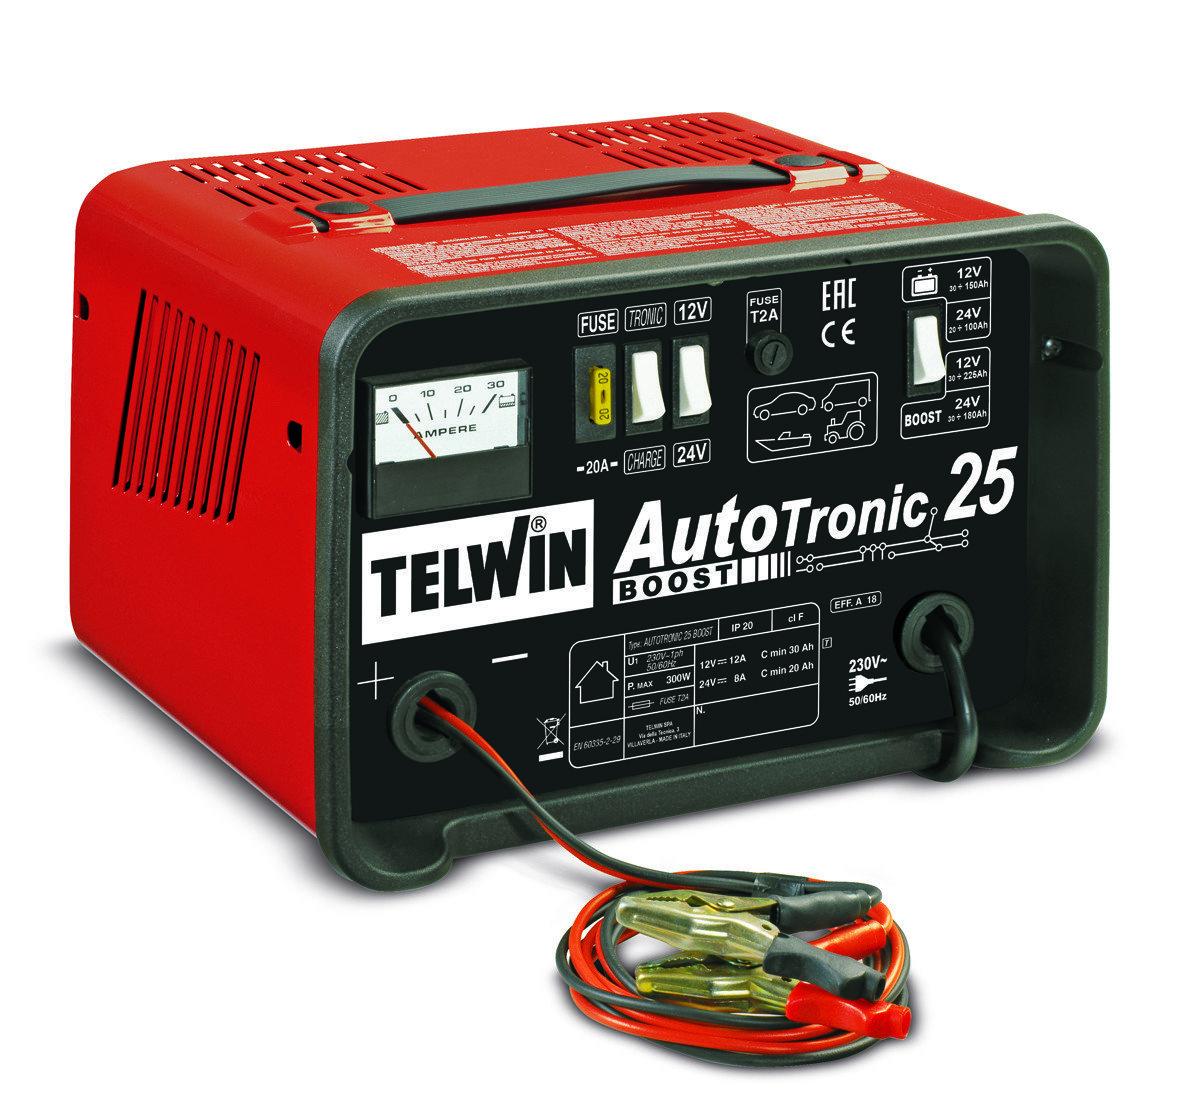 Зарядное устройство AUTOTRONIC 25 BOOST 12V/24V 807540